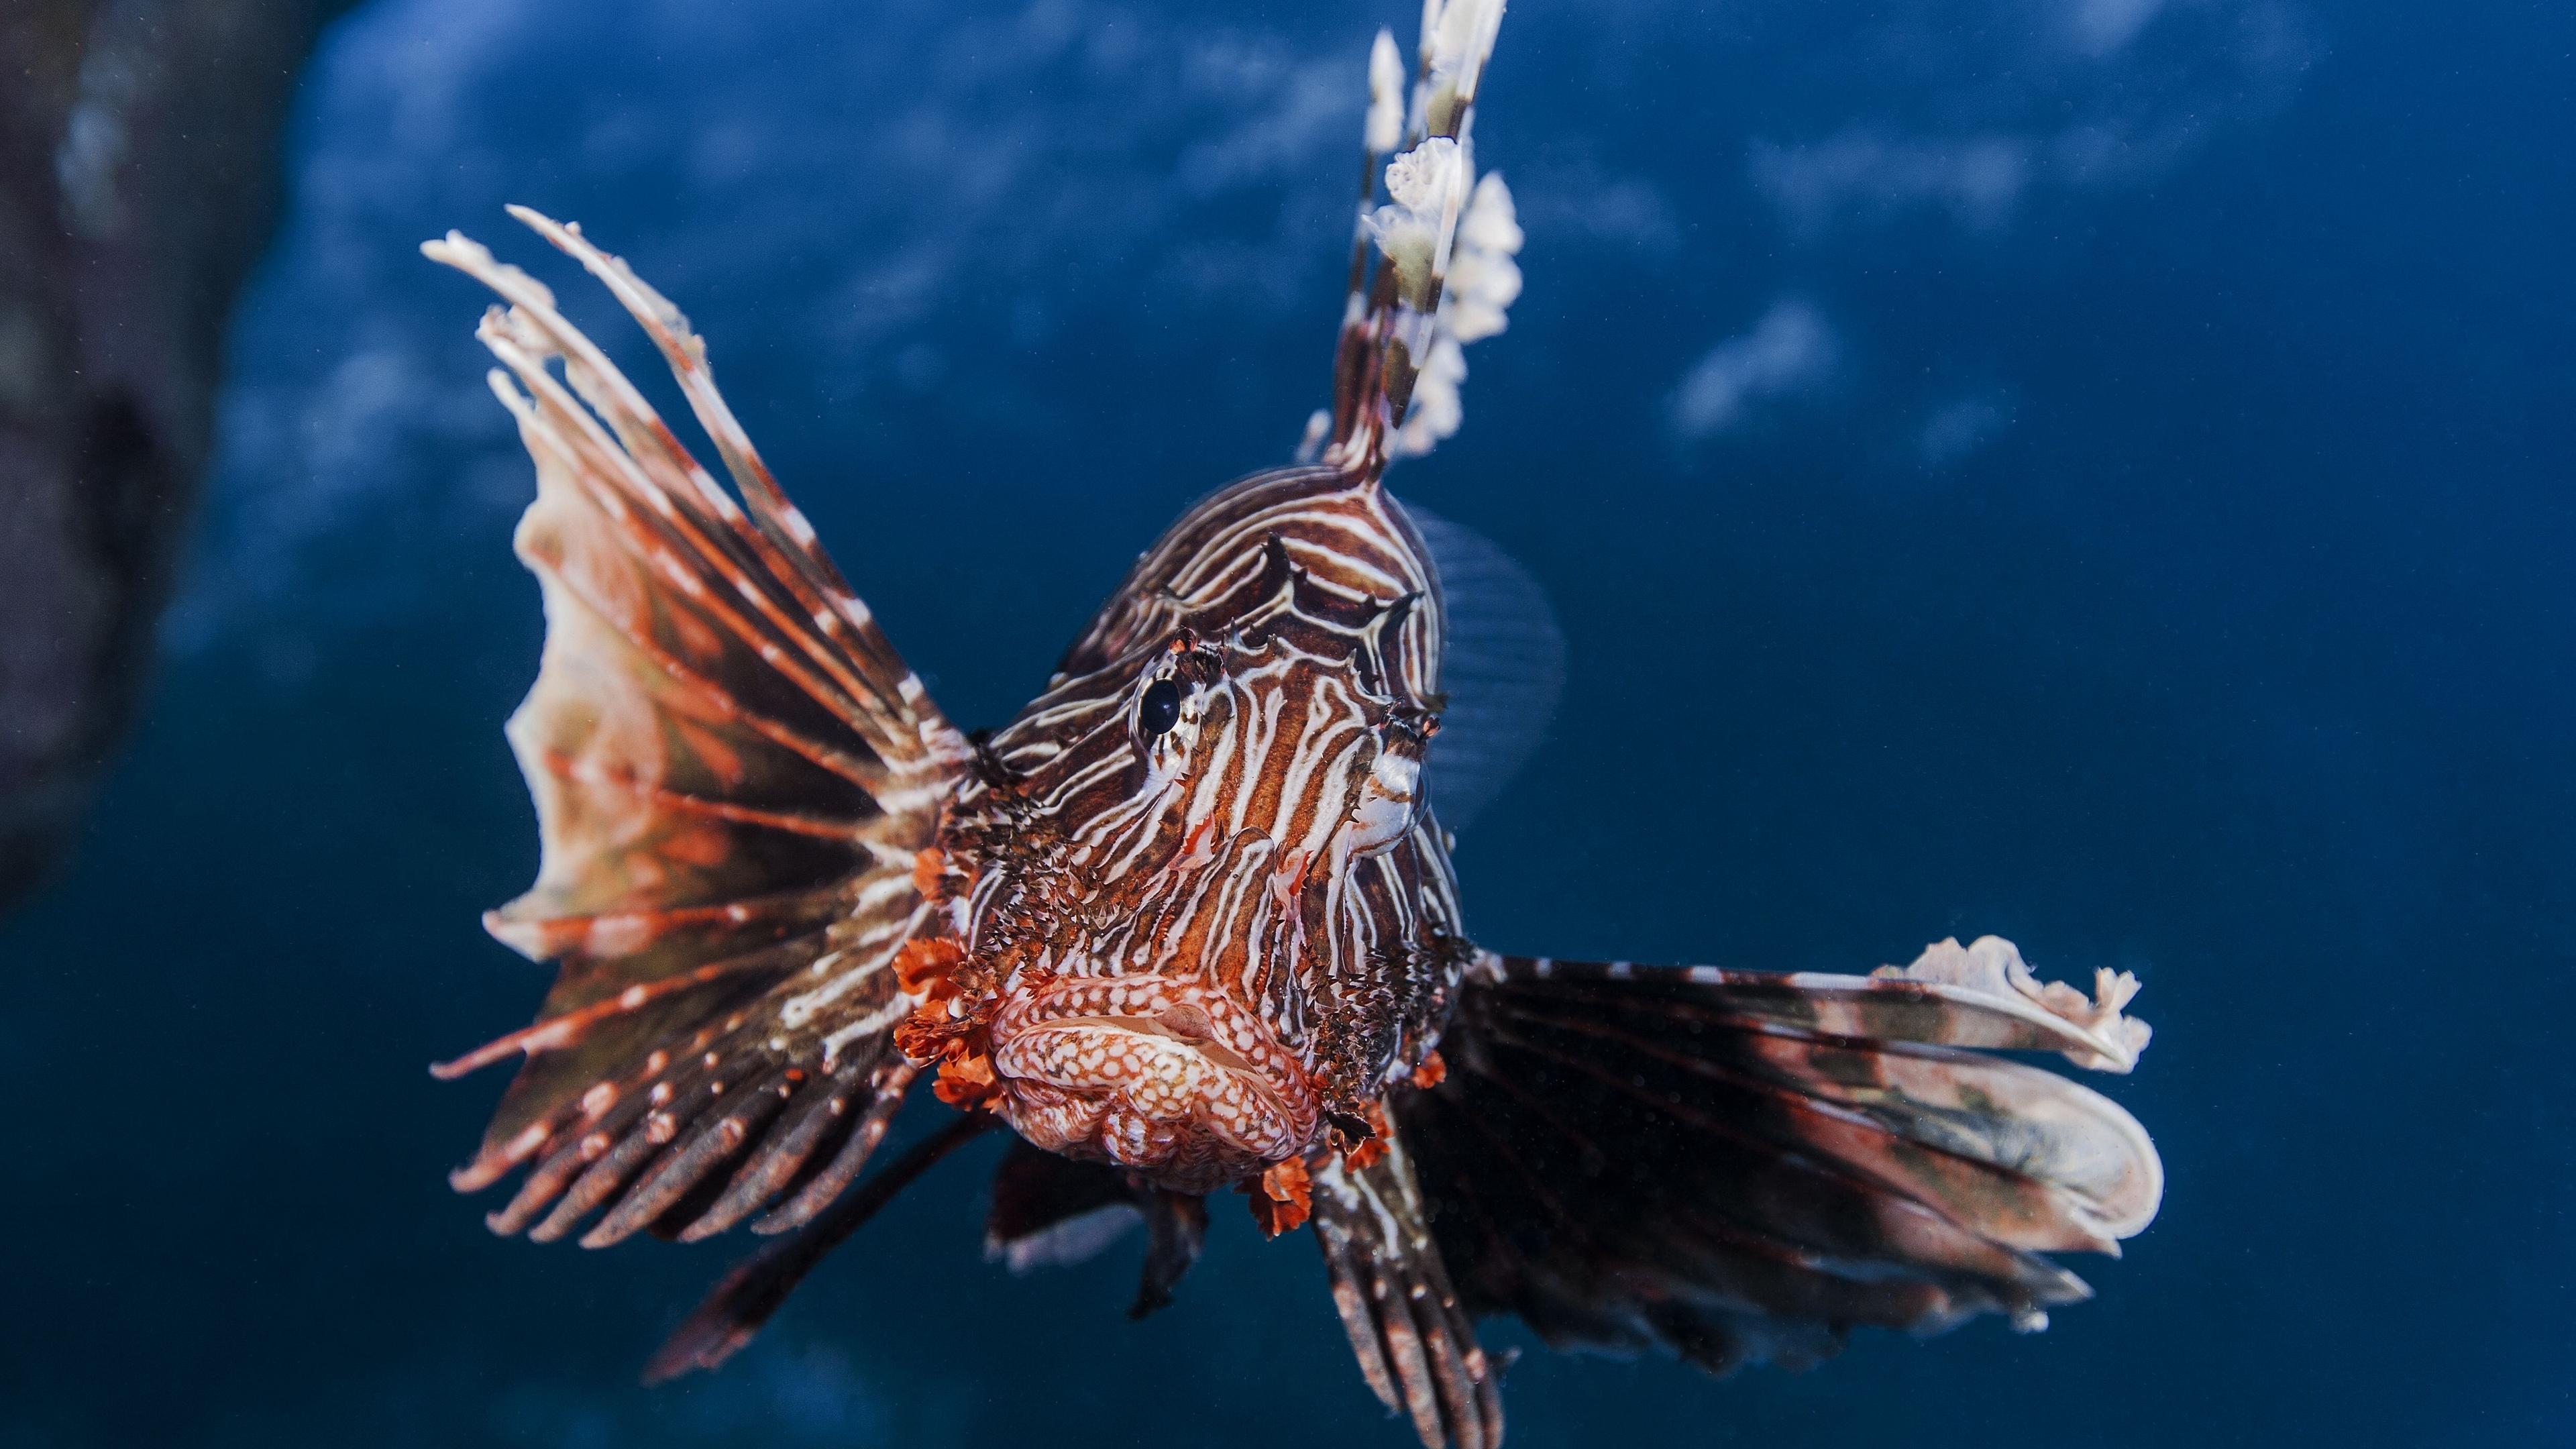 lionfish striped lionfish zebra fish broadbarred firefish 4k 1542241792 - lionfish, striped lionfish, zebra fish, broadbarred firefish 4k - zebra fish, striped lionfish, lionfish